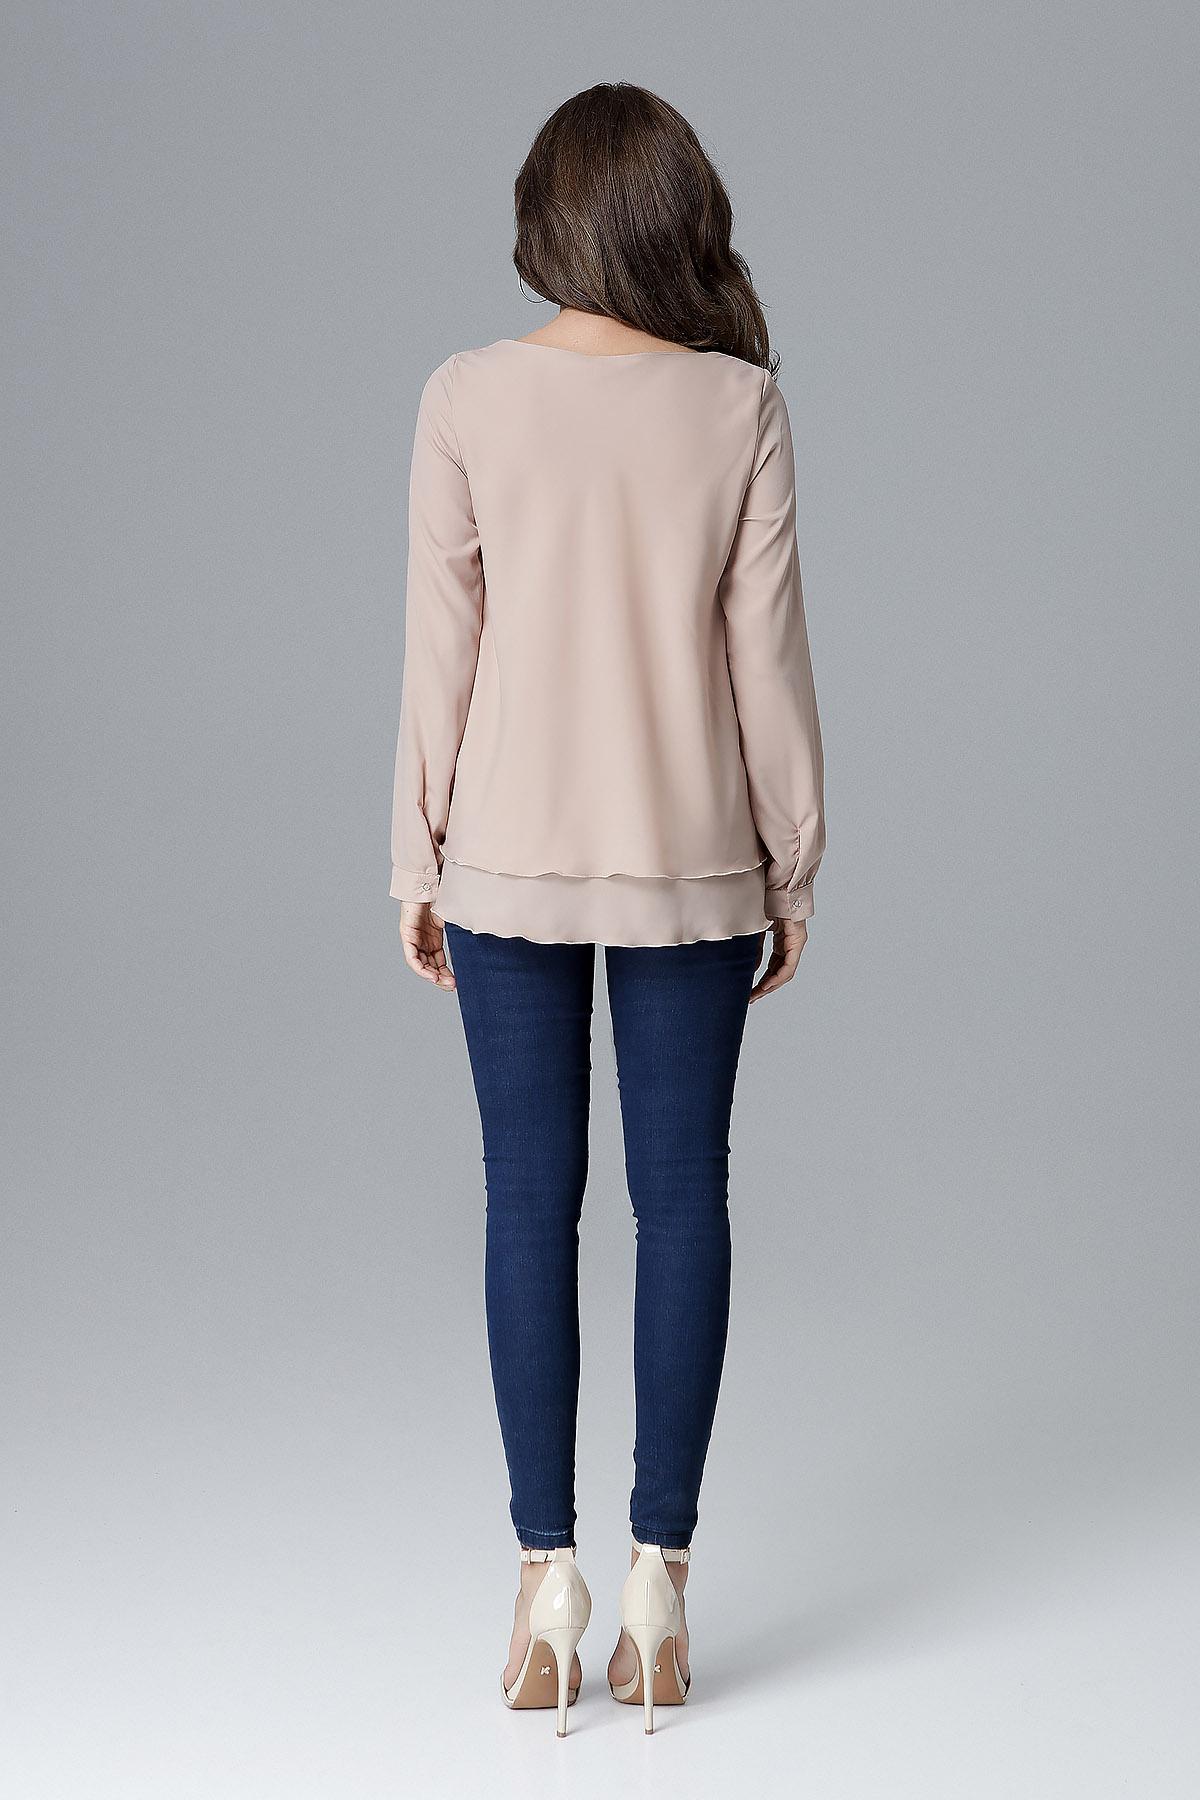 CM4157 Luźna bluzka damska z falbanką - beżowa